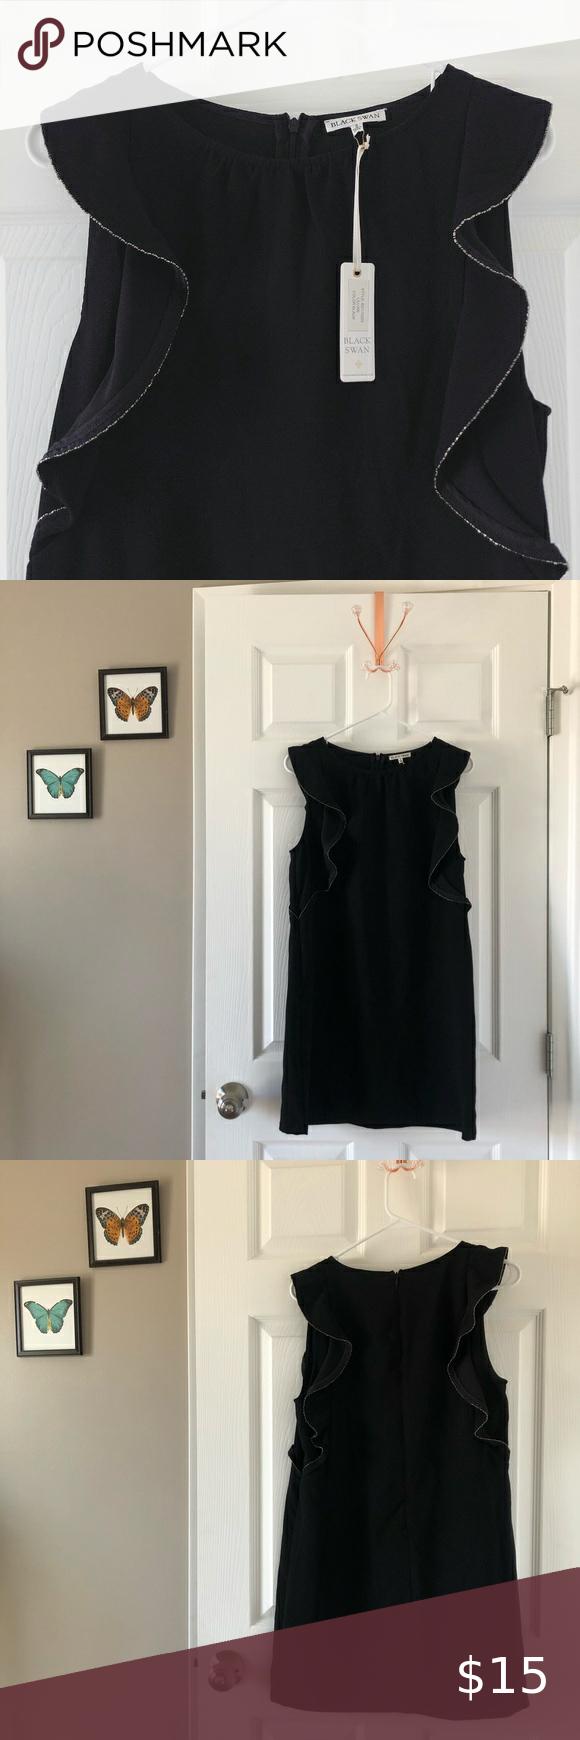 2 For 15 Lulu S Black Swan Lillian Dress Sz S In 2020 Lulu Dresses Clothes Design Swan Dress [ 1740 x 580 Pixel ]